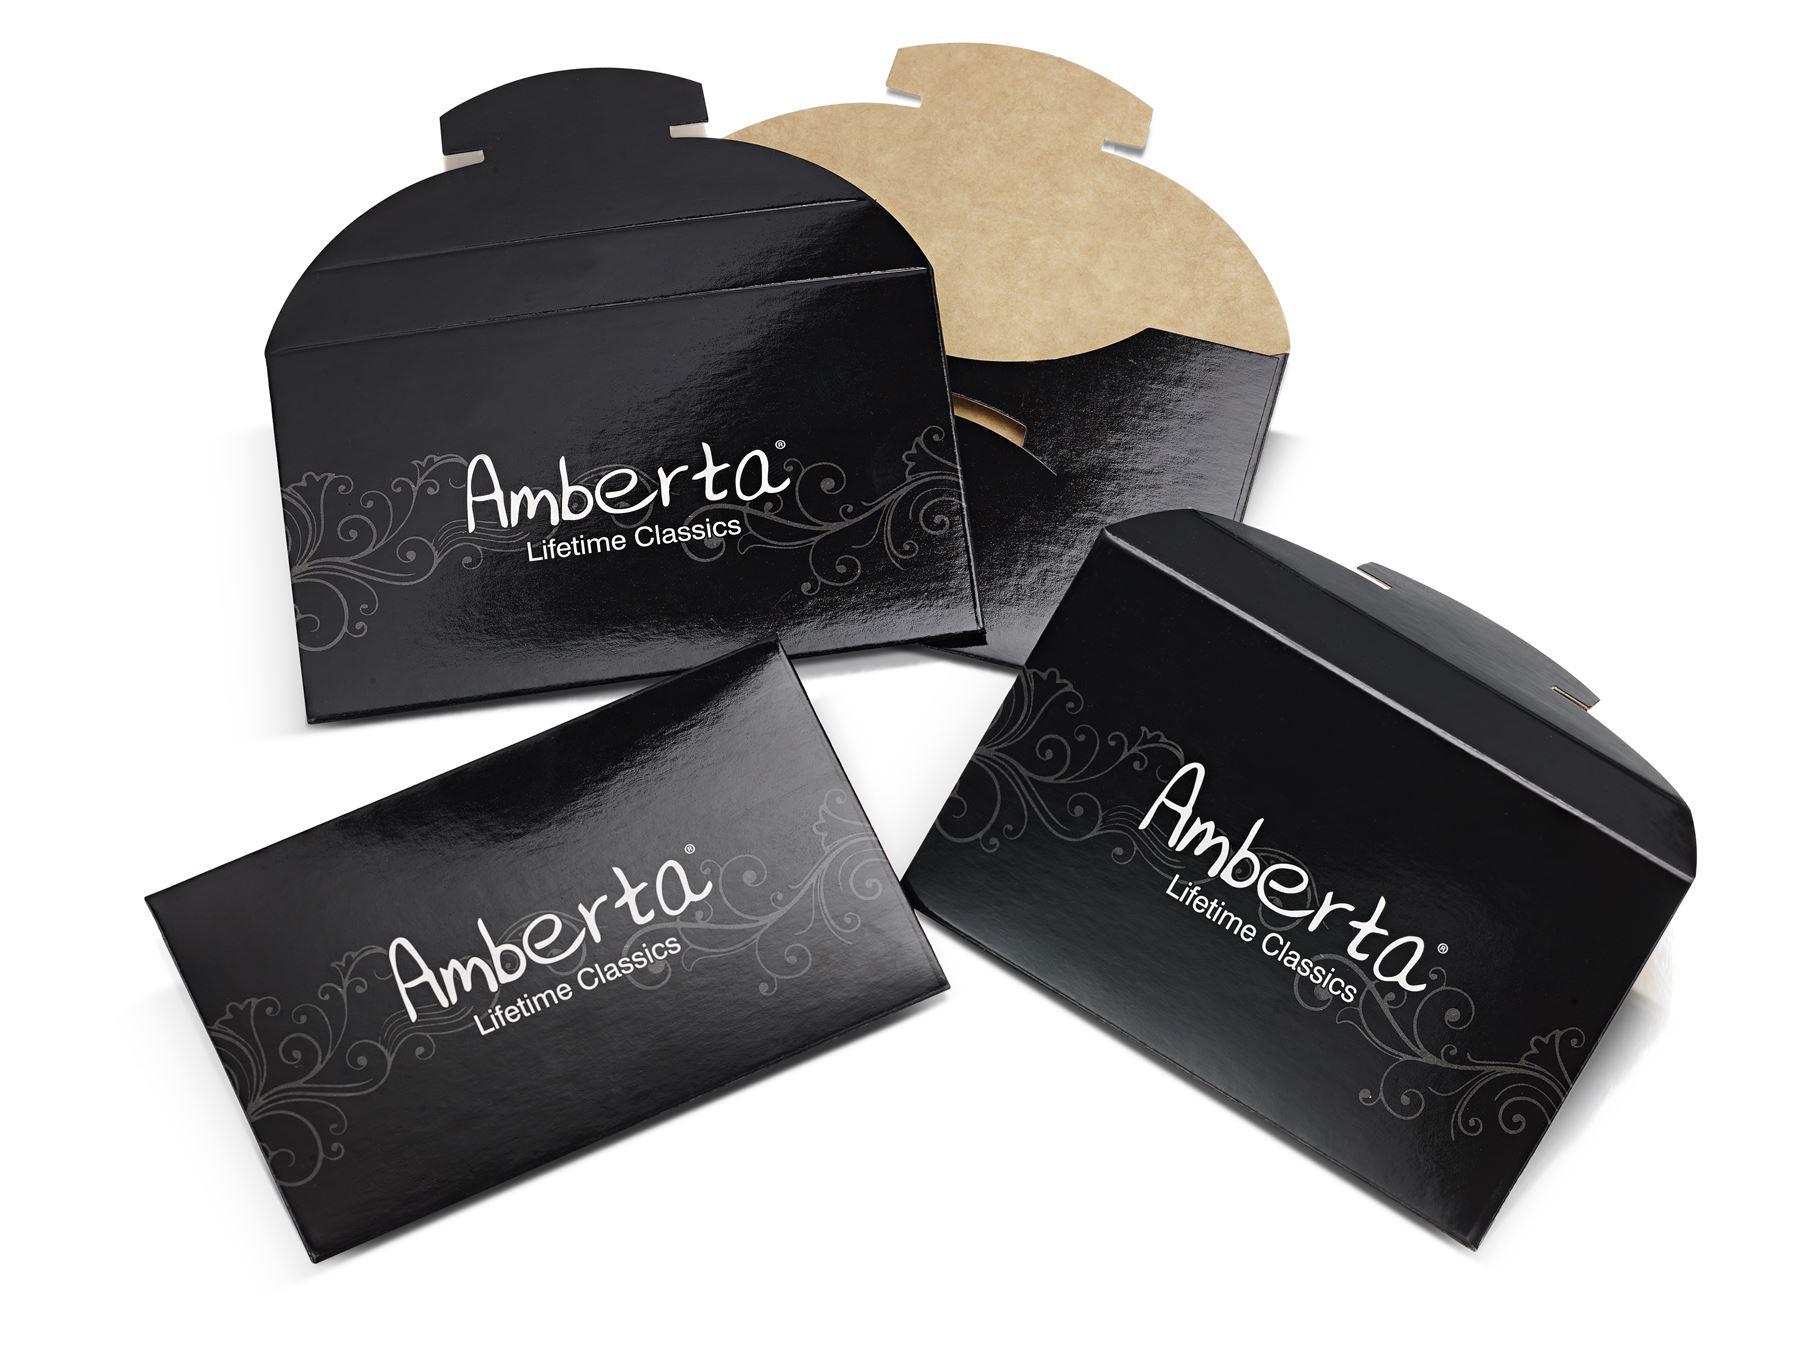 Amberta-Jewelry-925-Sterling-Silver-Adjustable-Bracelet-Italian-Bangle-for-Women thumbnail 37